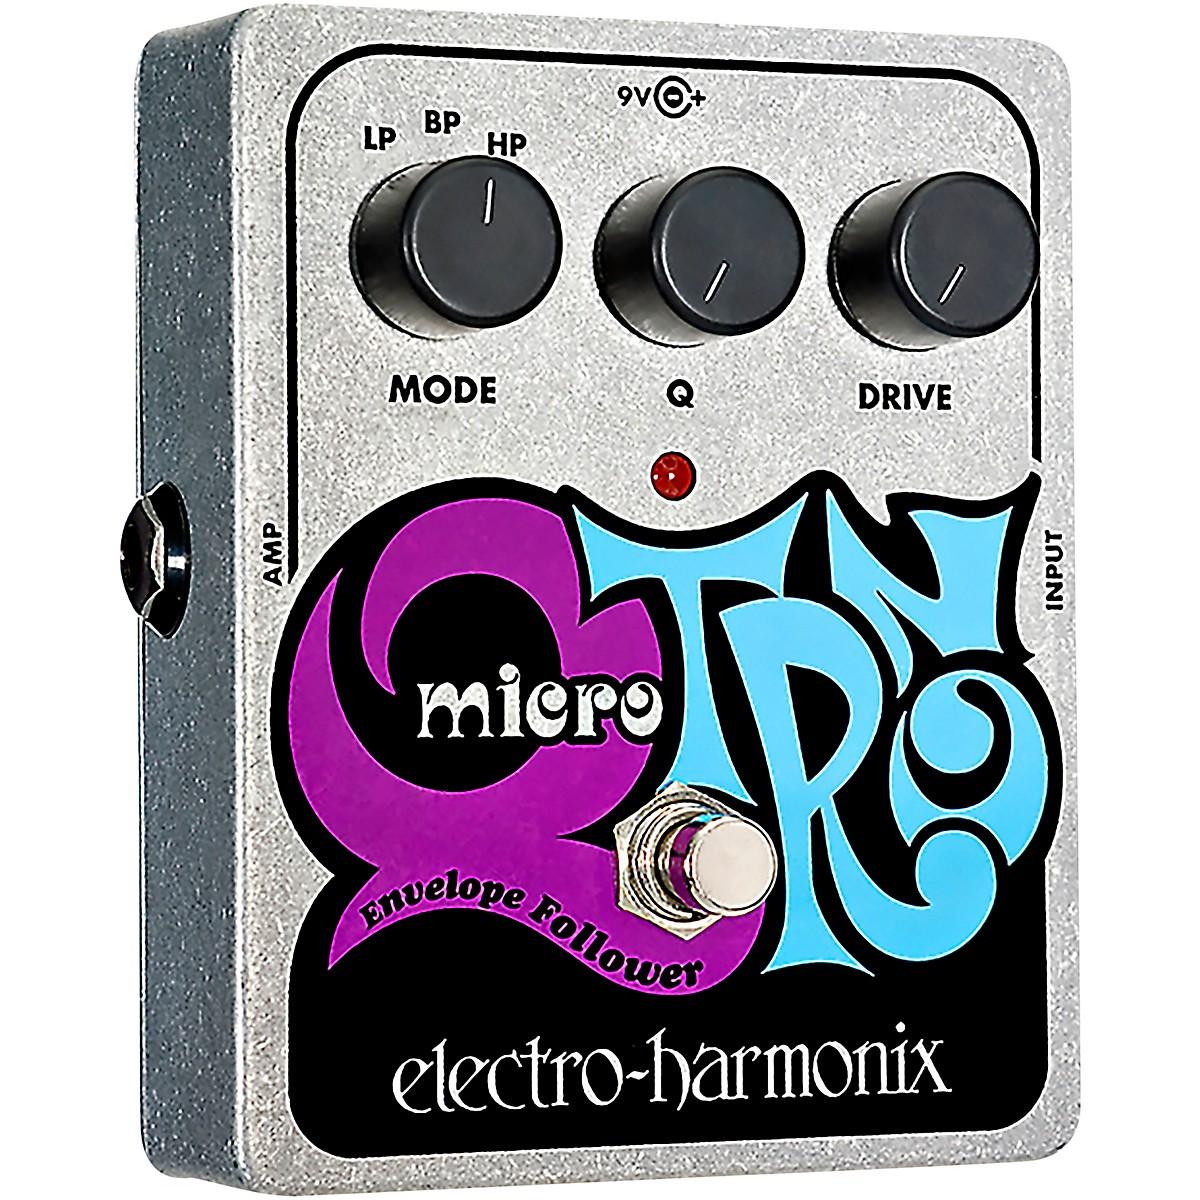 Electro-Harmonix XO Micro Q-Tron Envelope Filter Guitar Effects Pedal